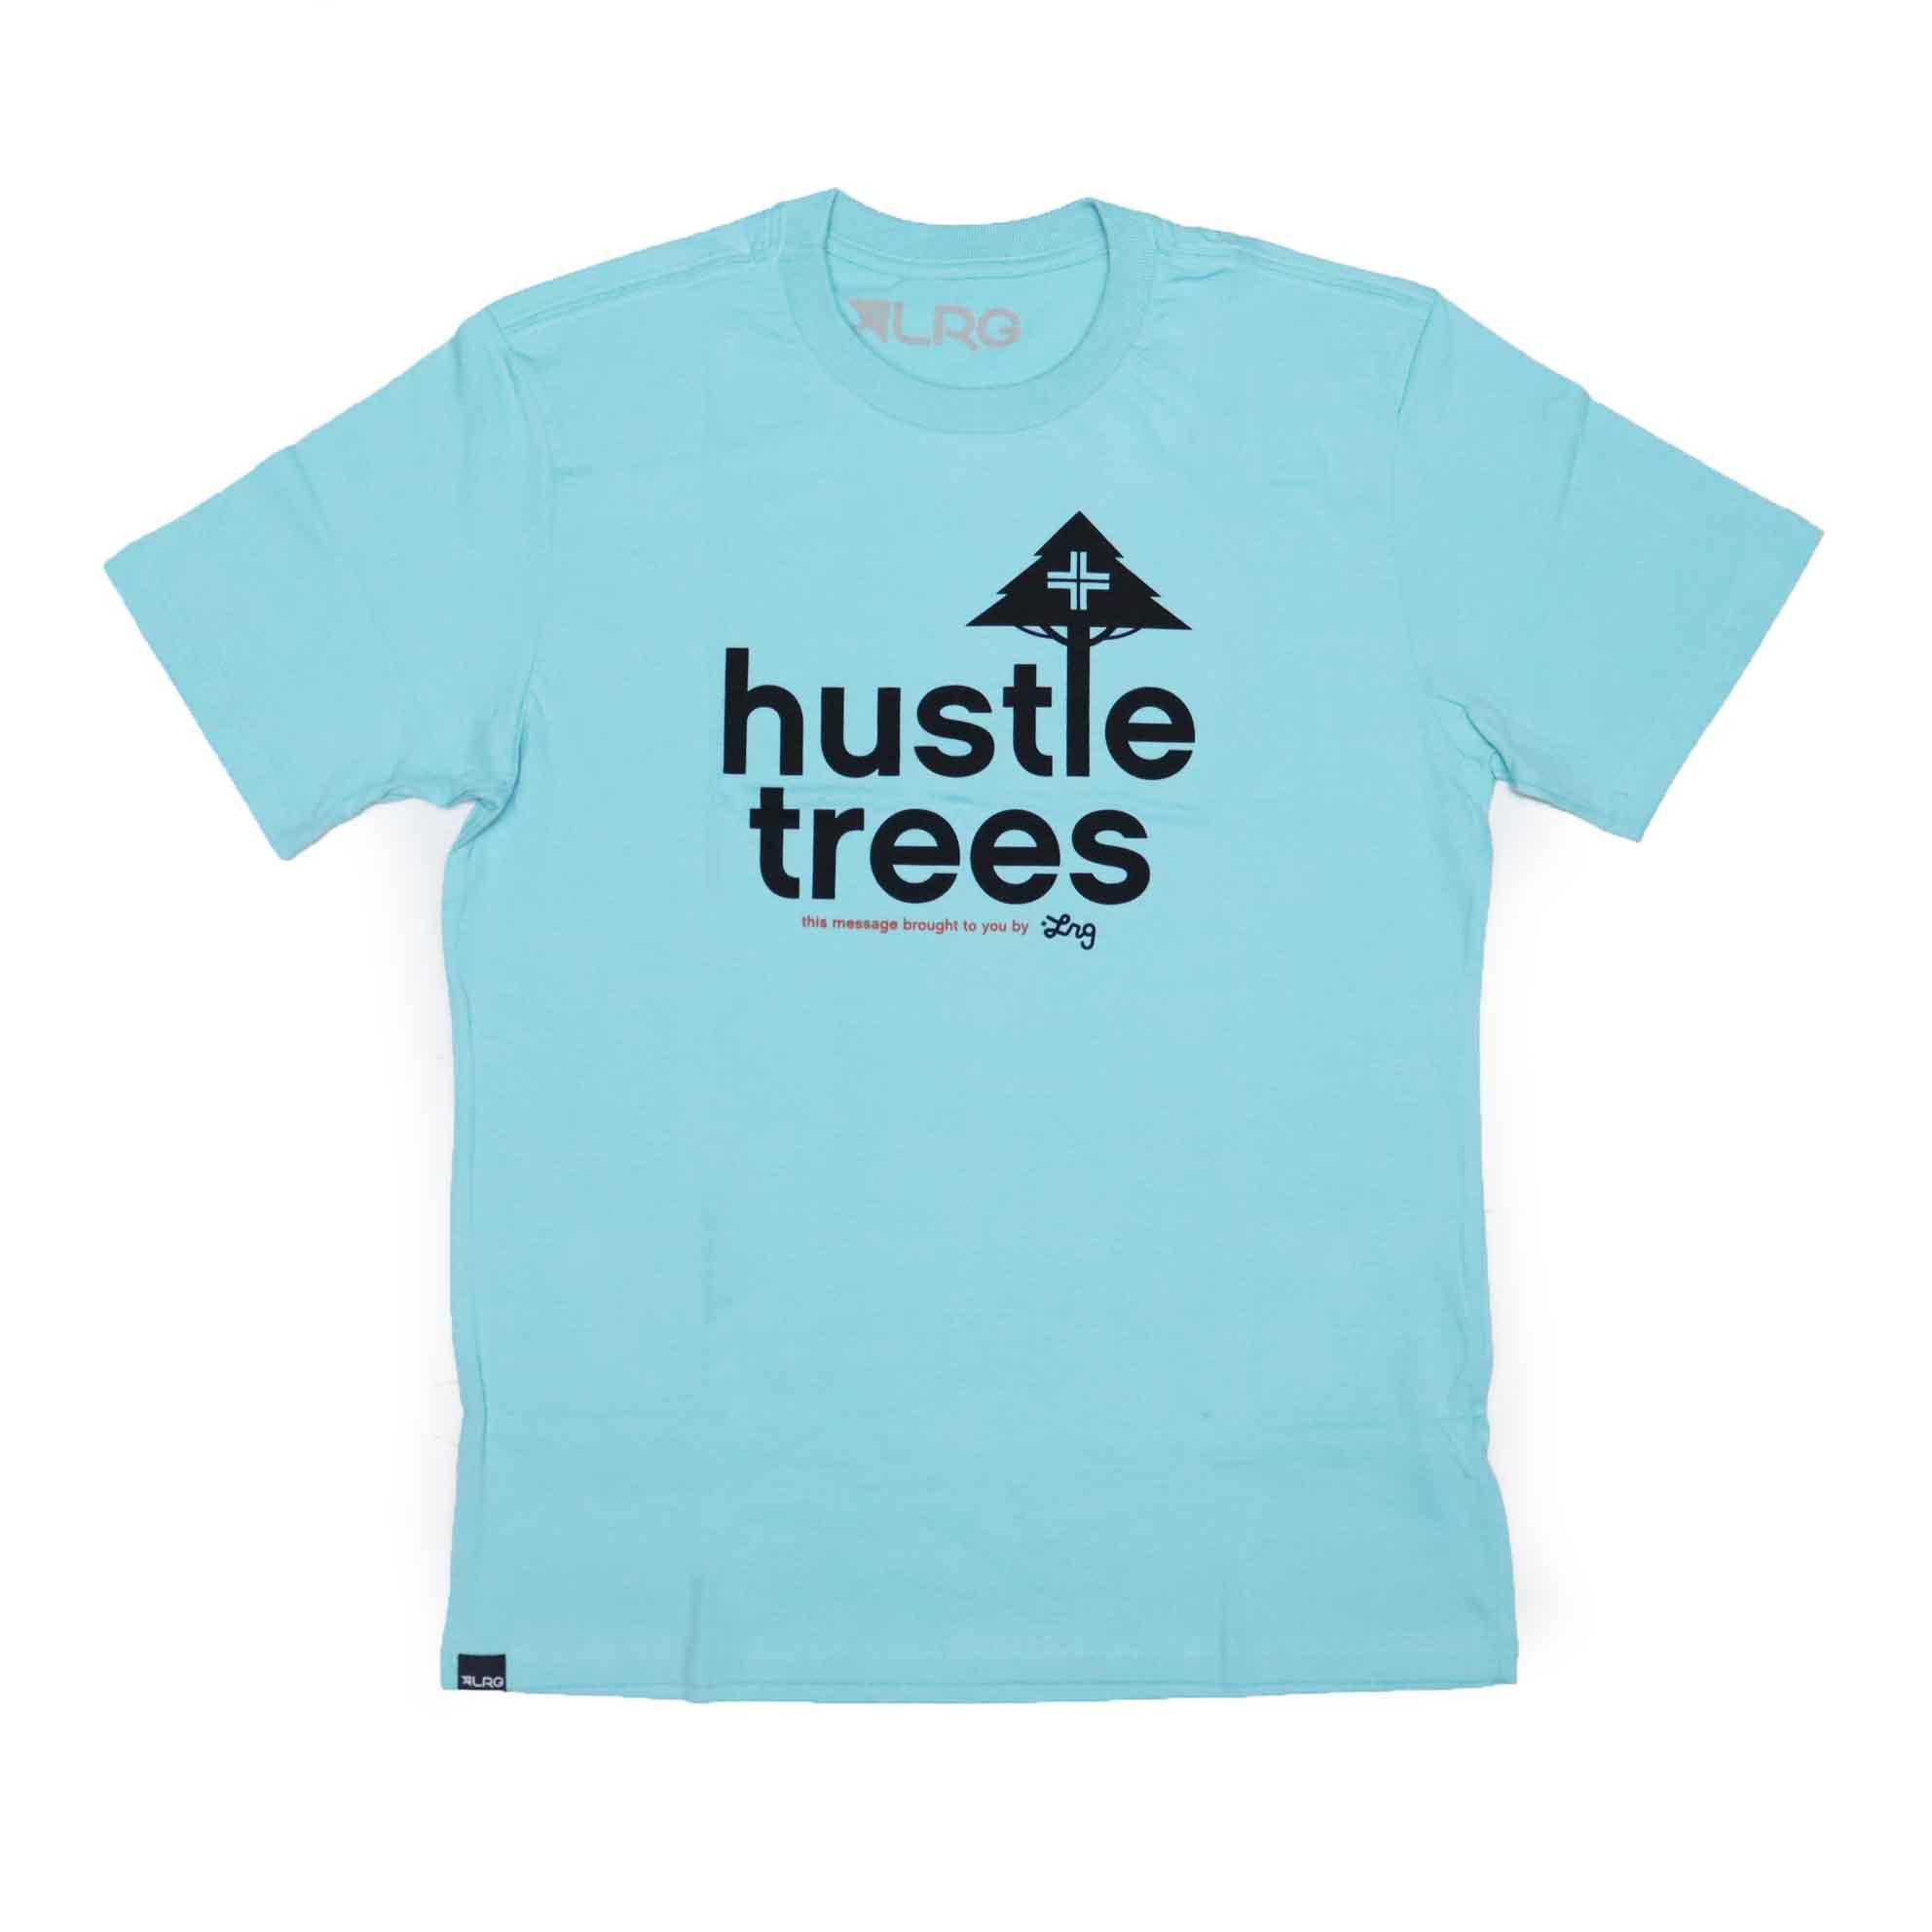 Camiseta LRG Hustle Trees - Azul Claro